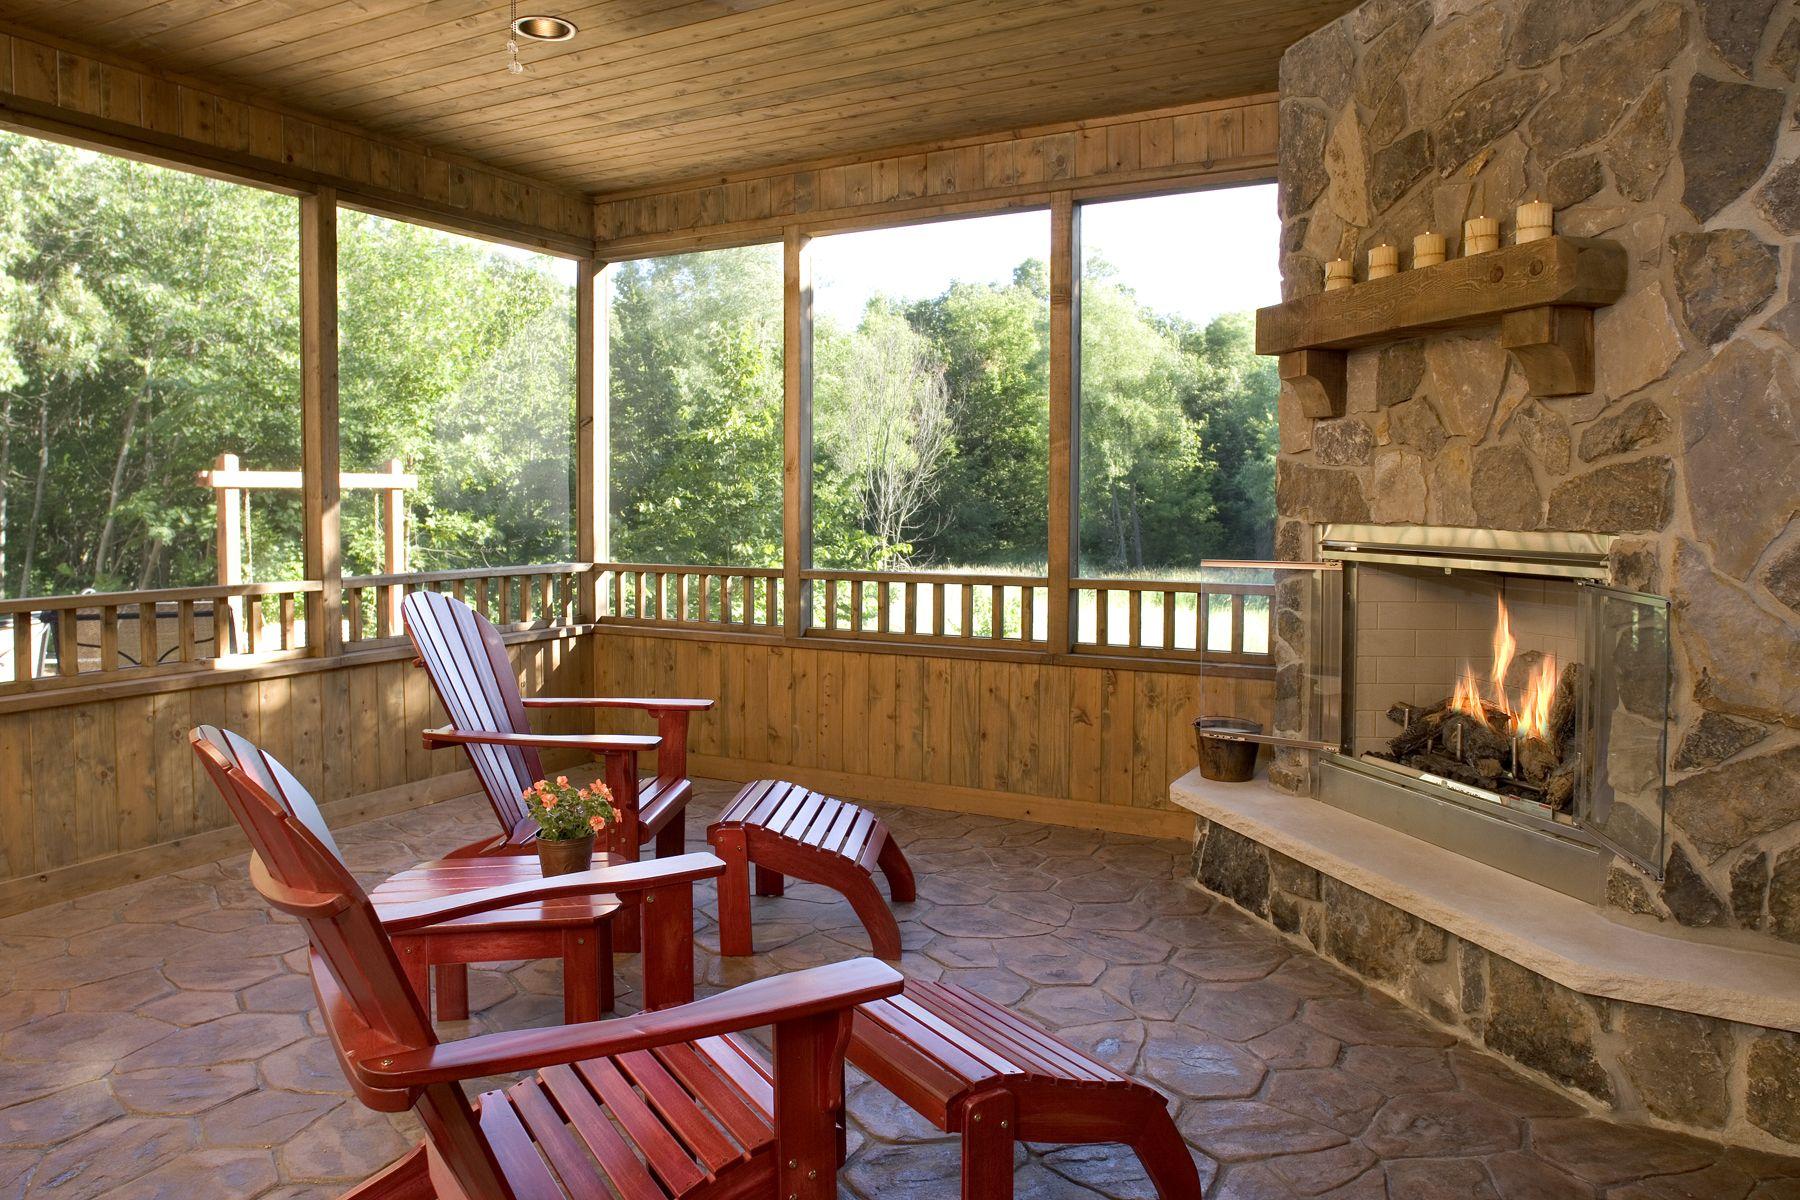 an outdoor gas fireplace | Back porch ideas | Pinterest on Outdoor Gas Fireplace For Deck id=12000